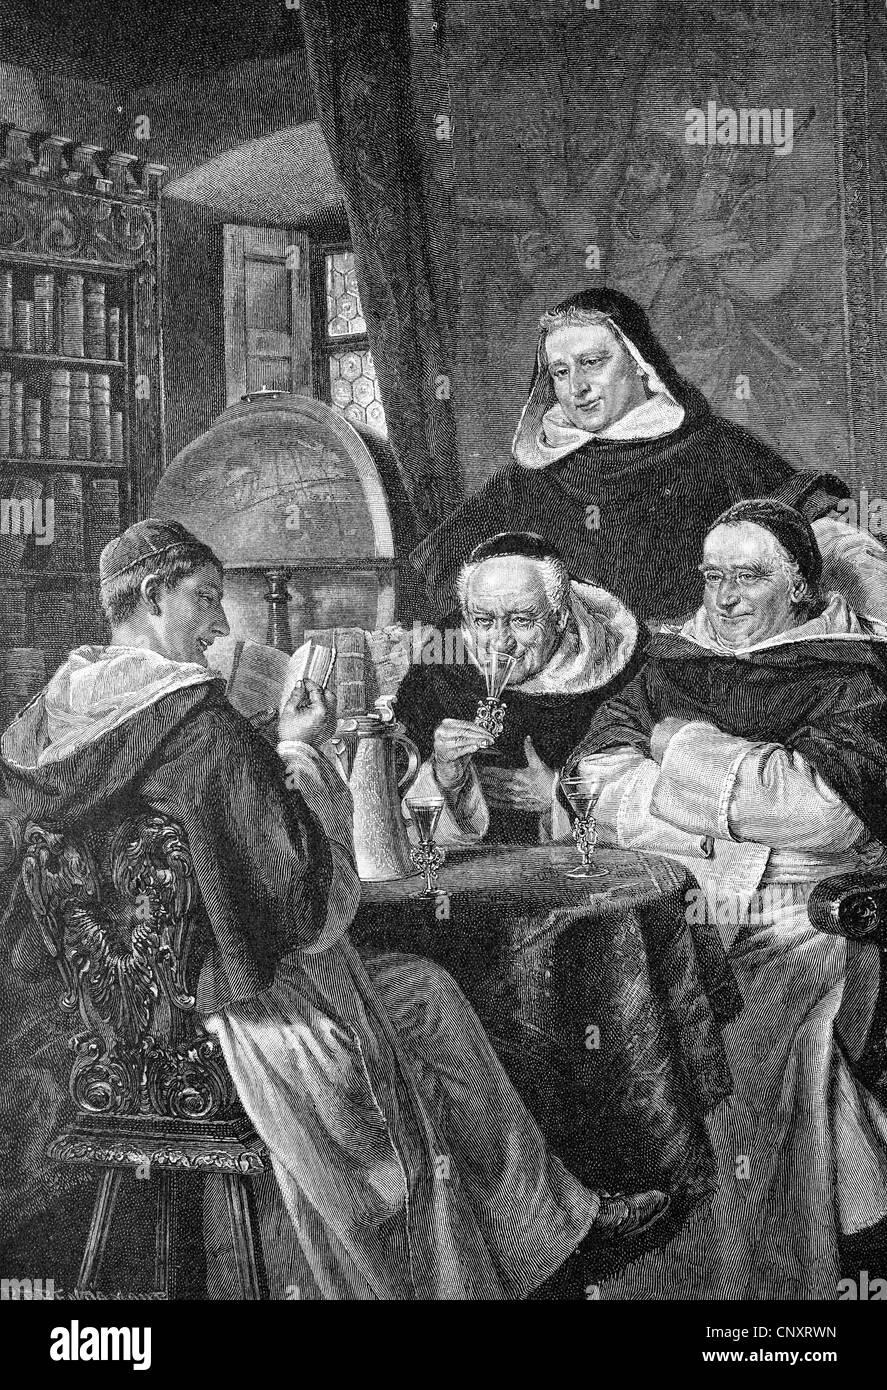 Monks drinking wine, historic engraving, 1888 - Stock Image